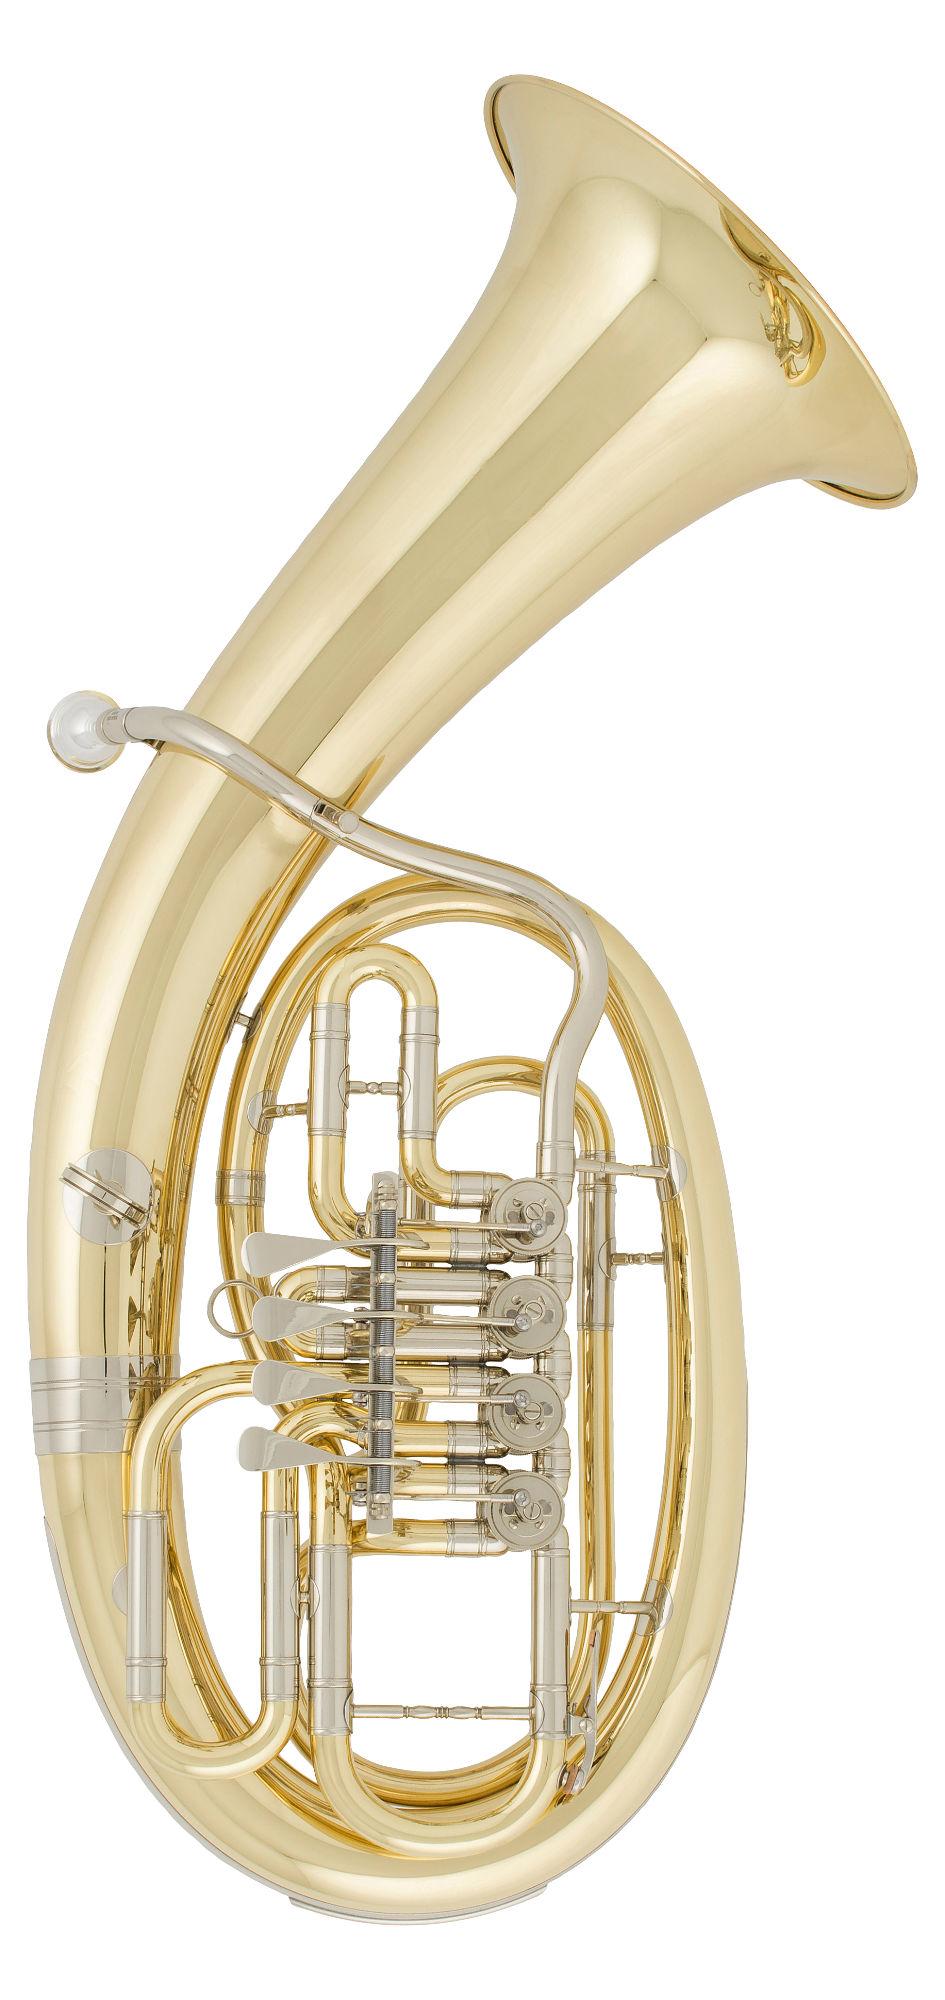 Baritone - Josef Lidl LEP531 4 B Baritonhorn - Onlineshop Musikhaus Kirstein